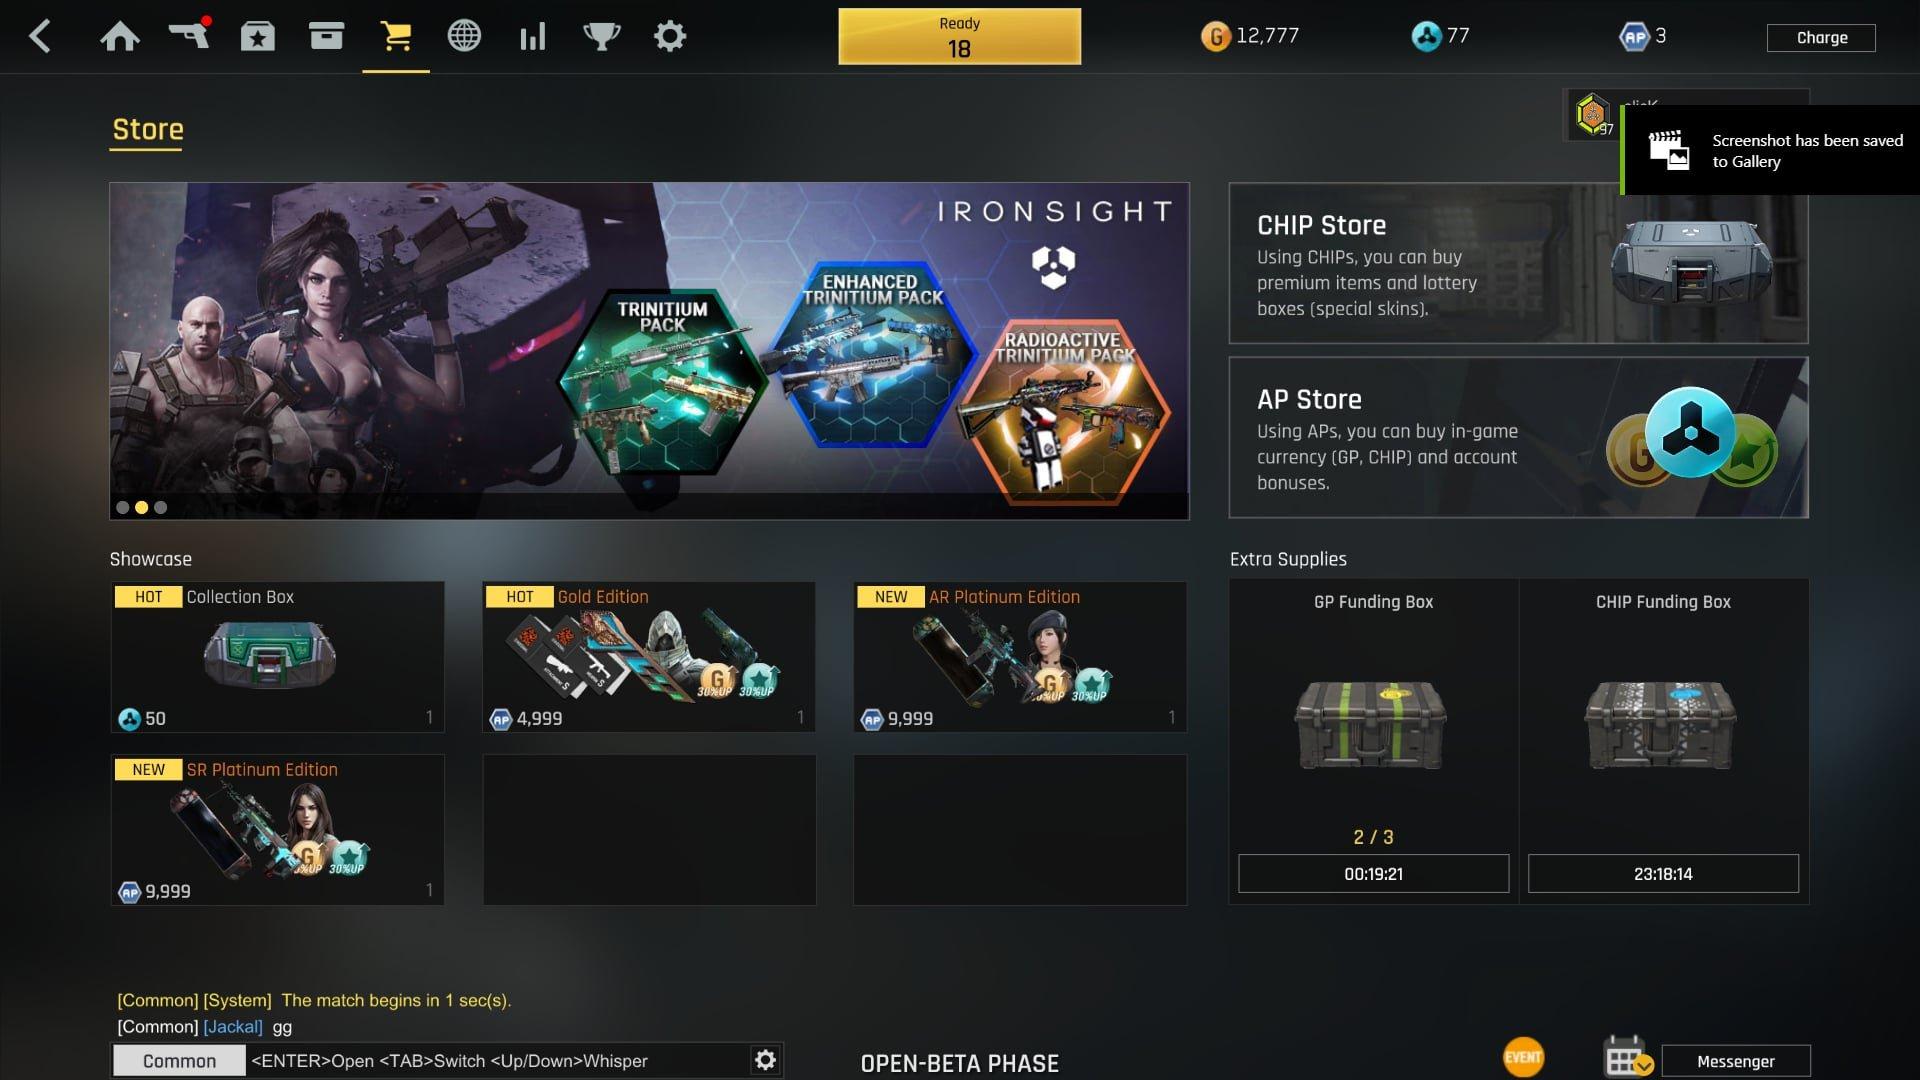 Ironsight Shop